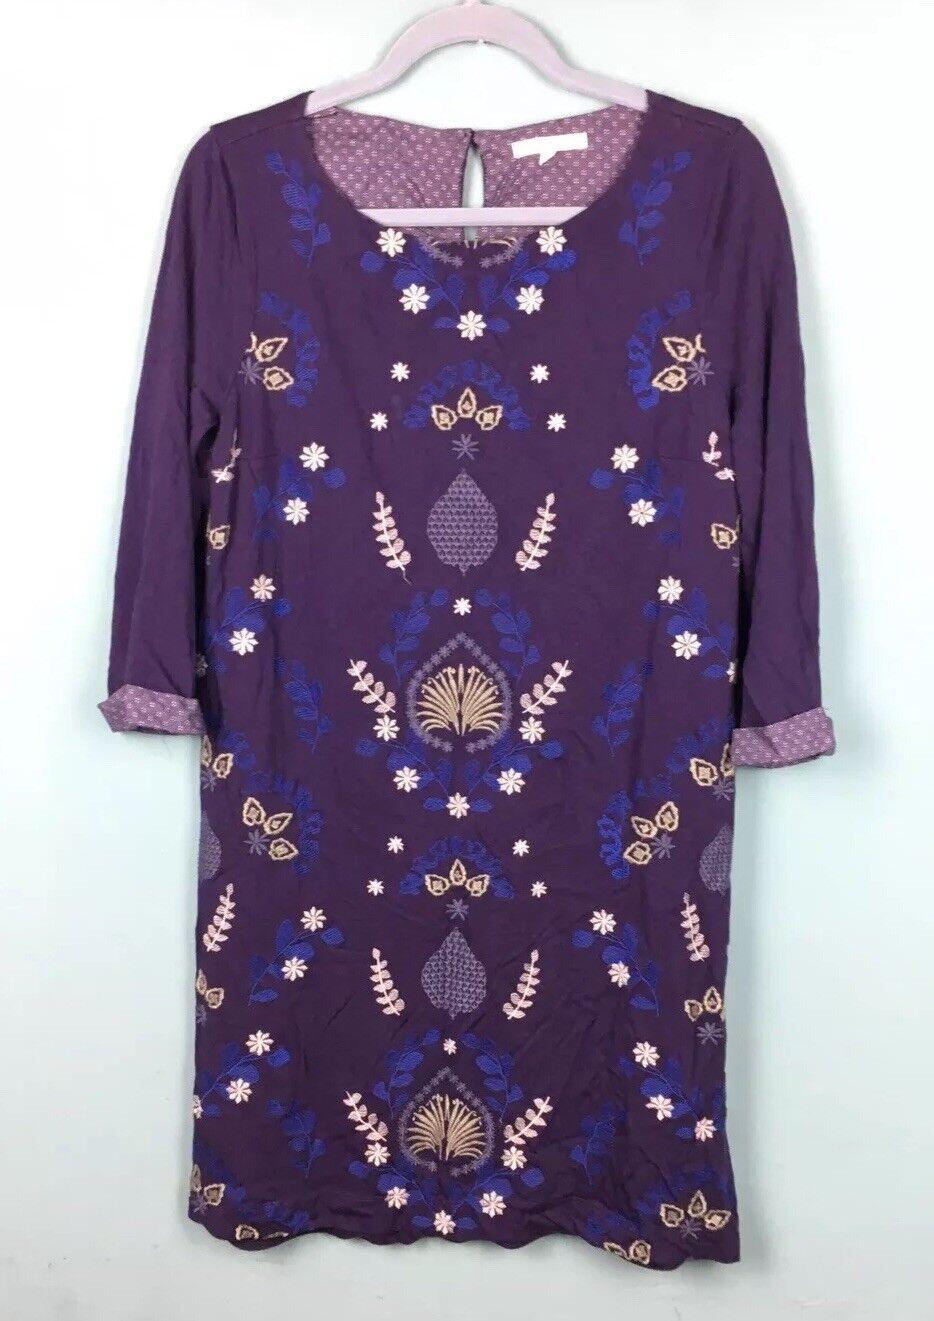 2326bfdc8df White Stuff Navy Embroidered Tunic Mini Dress Size 14 - B51 Purple Jersey  ntbjke11327-Dresses